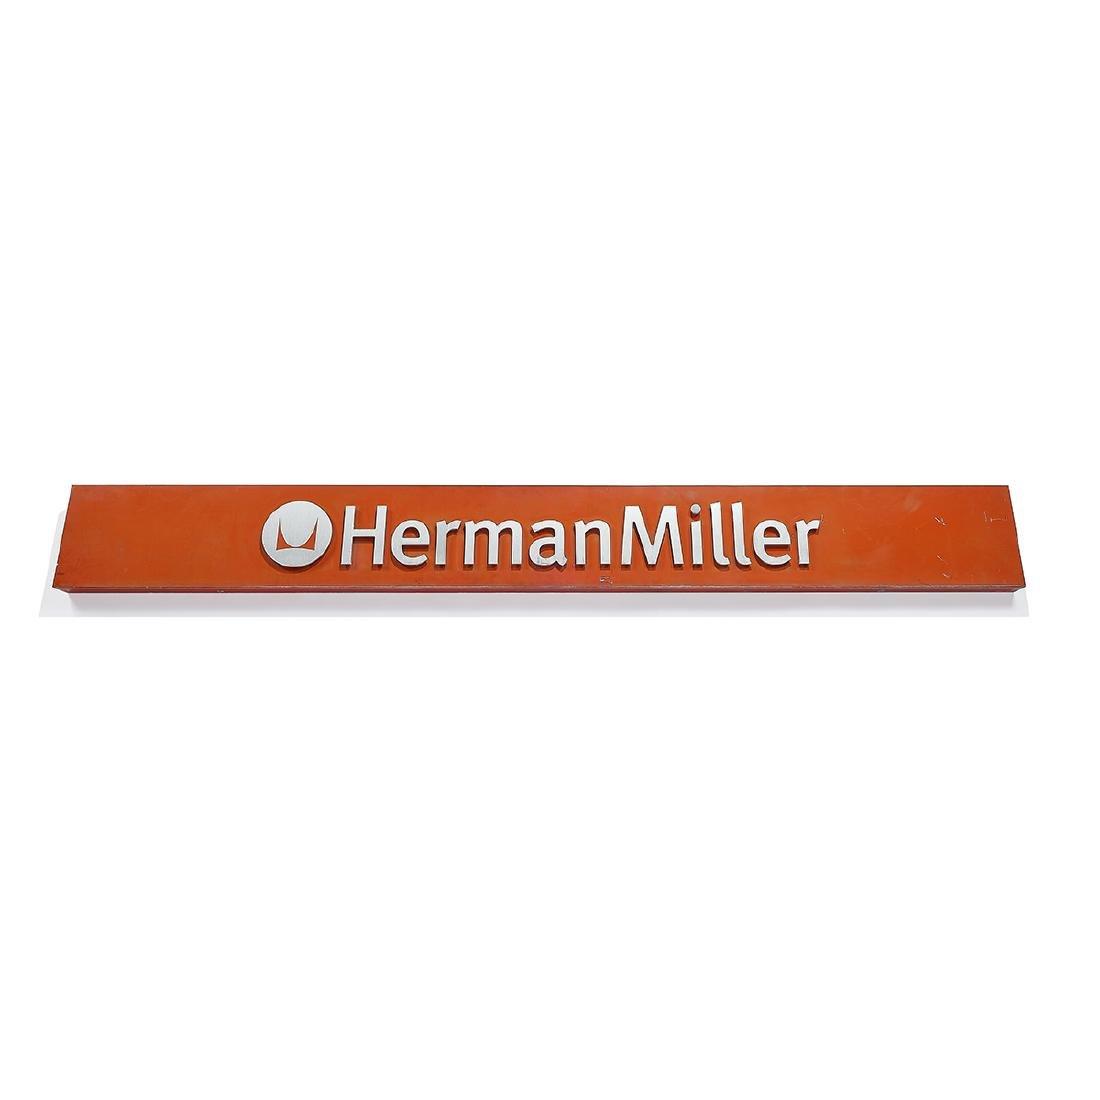 Herman Miller, Inc. large outdoor sign